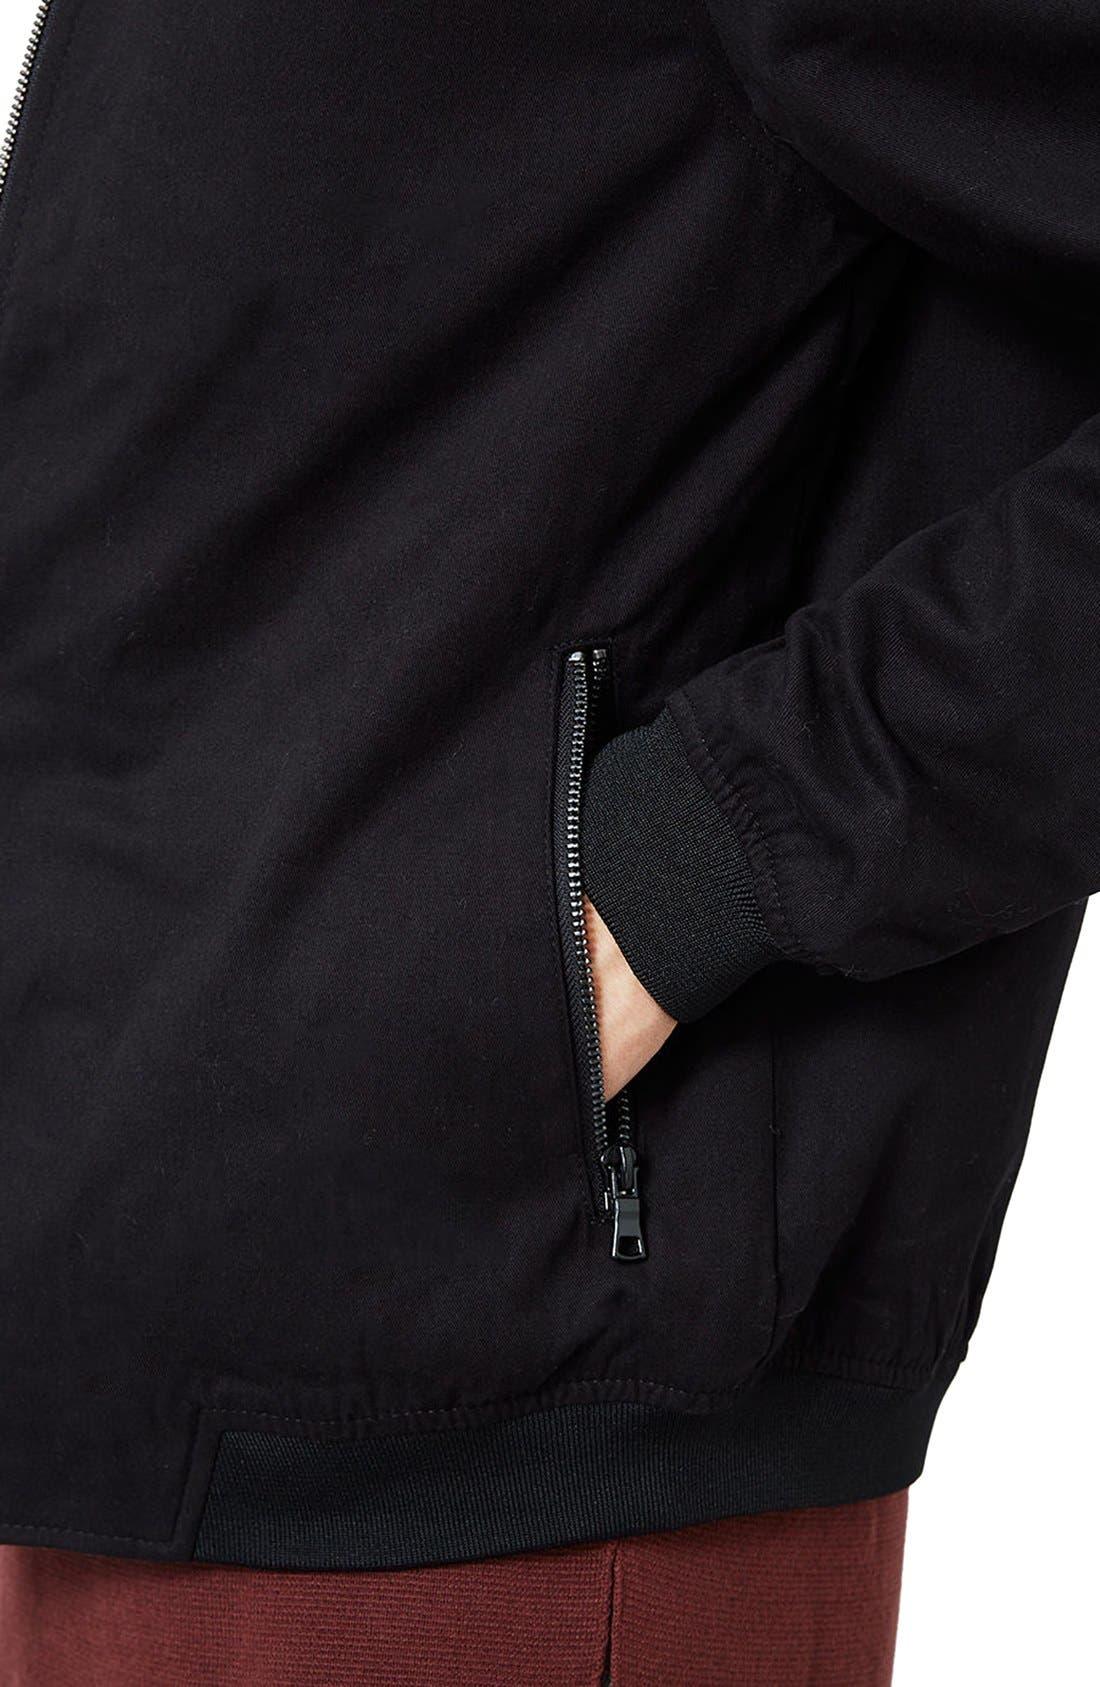 Cotton Bomber Jacket,                             Alternate thumbnail 4, color,                             Black